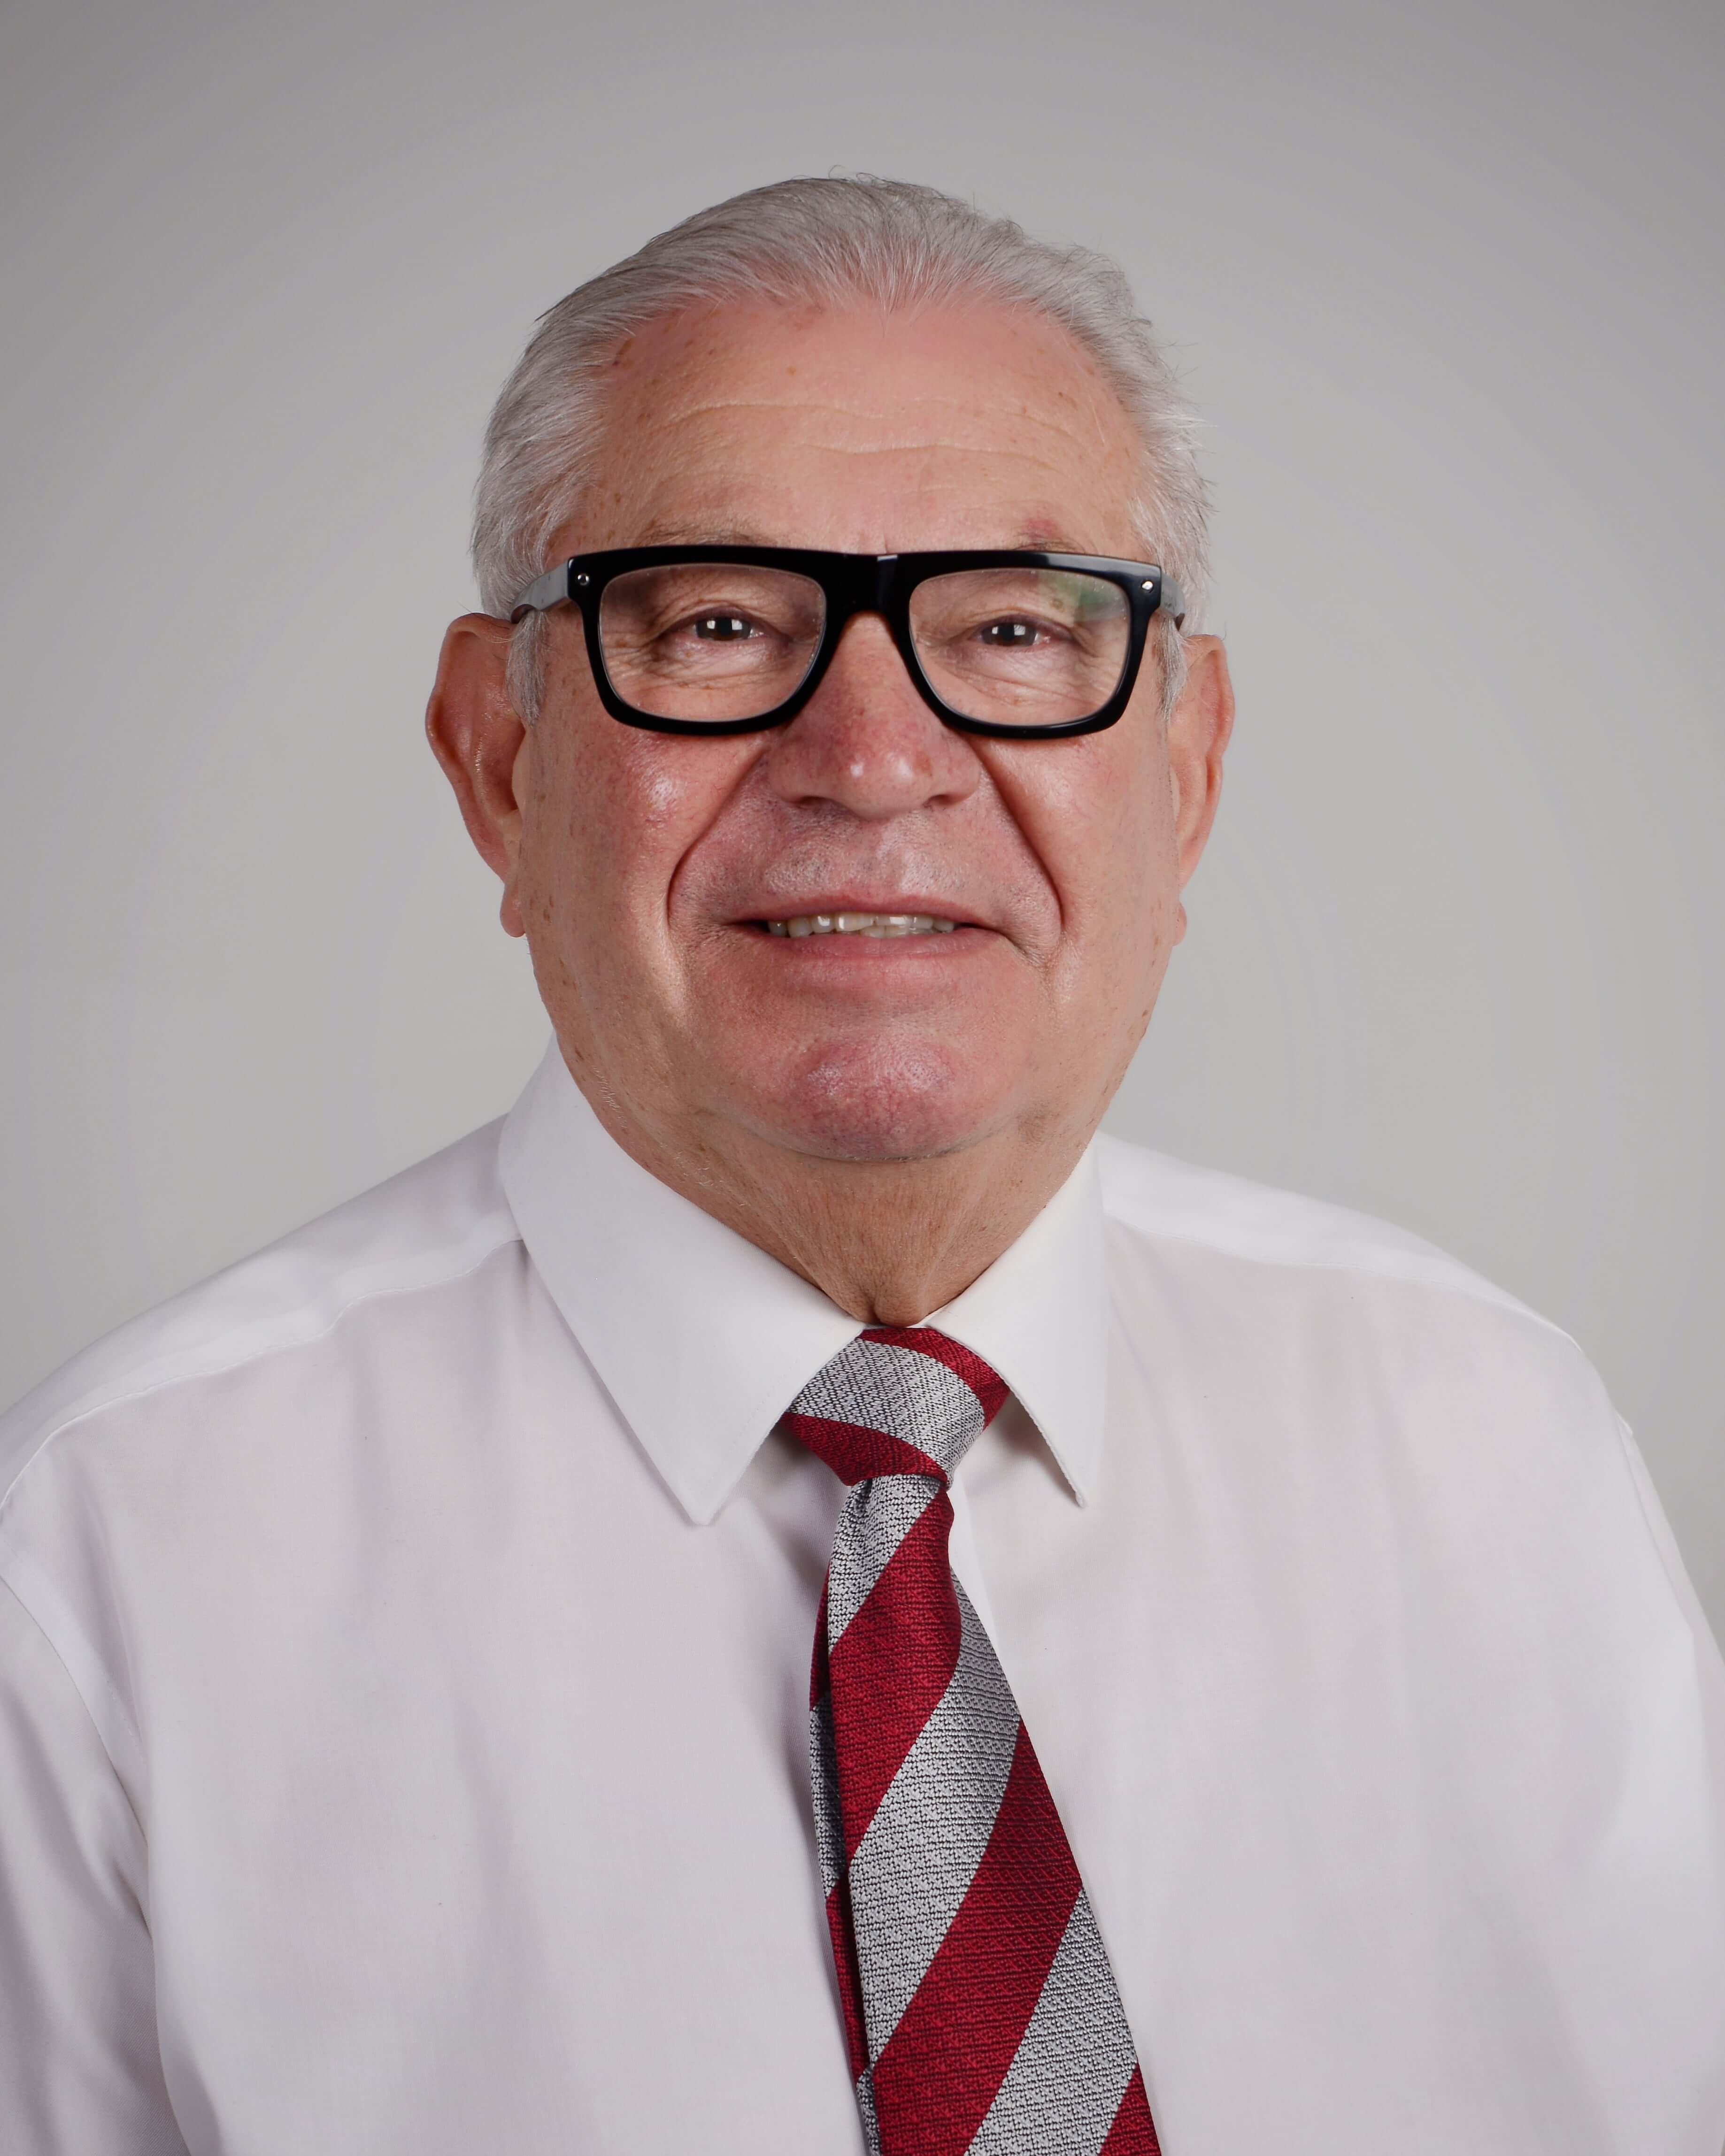 Jeff Charlton